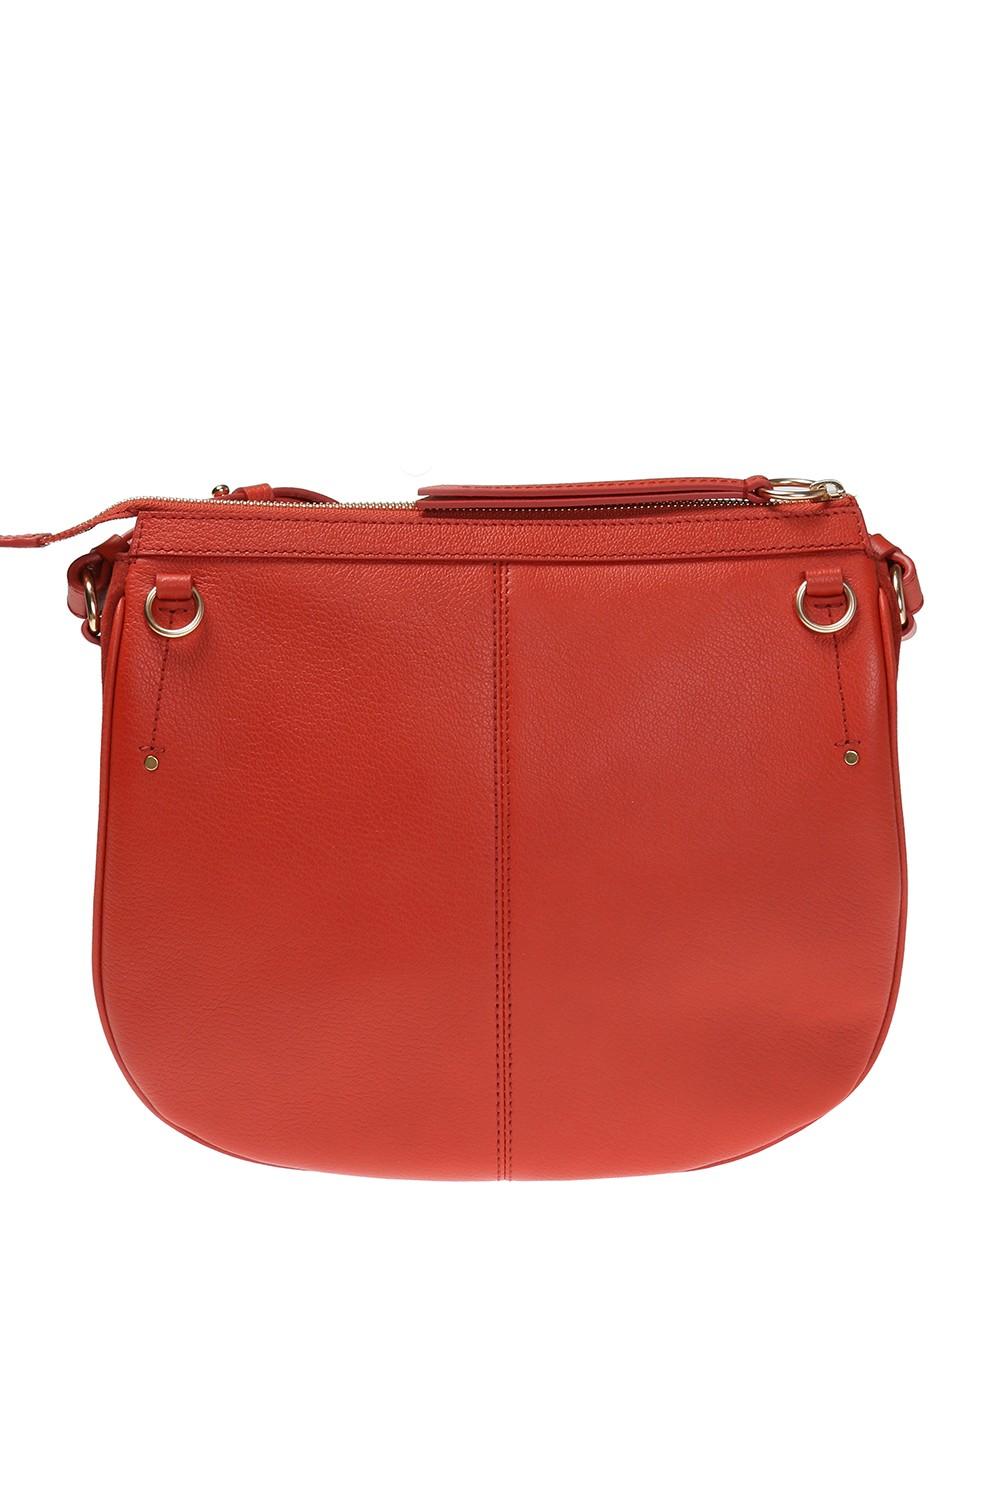 See By Chloe 'Hana' shoulder bag